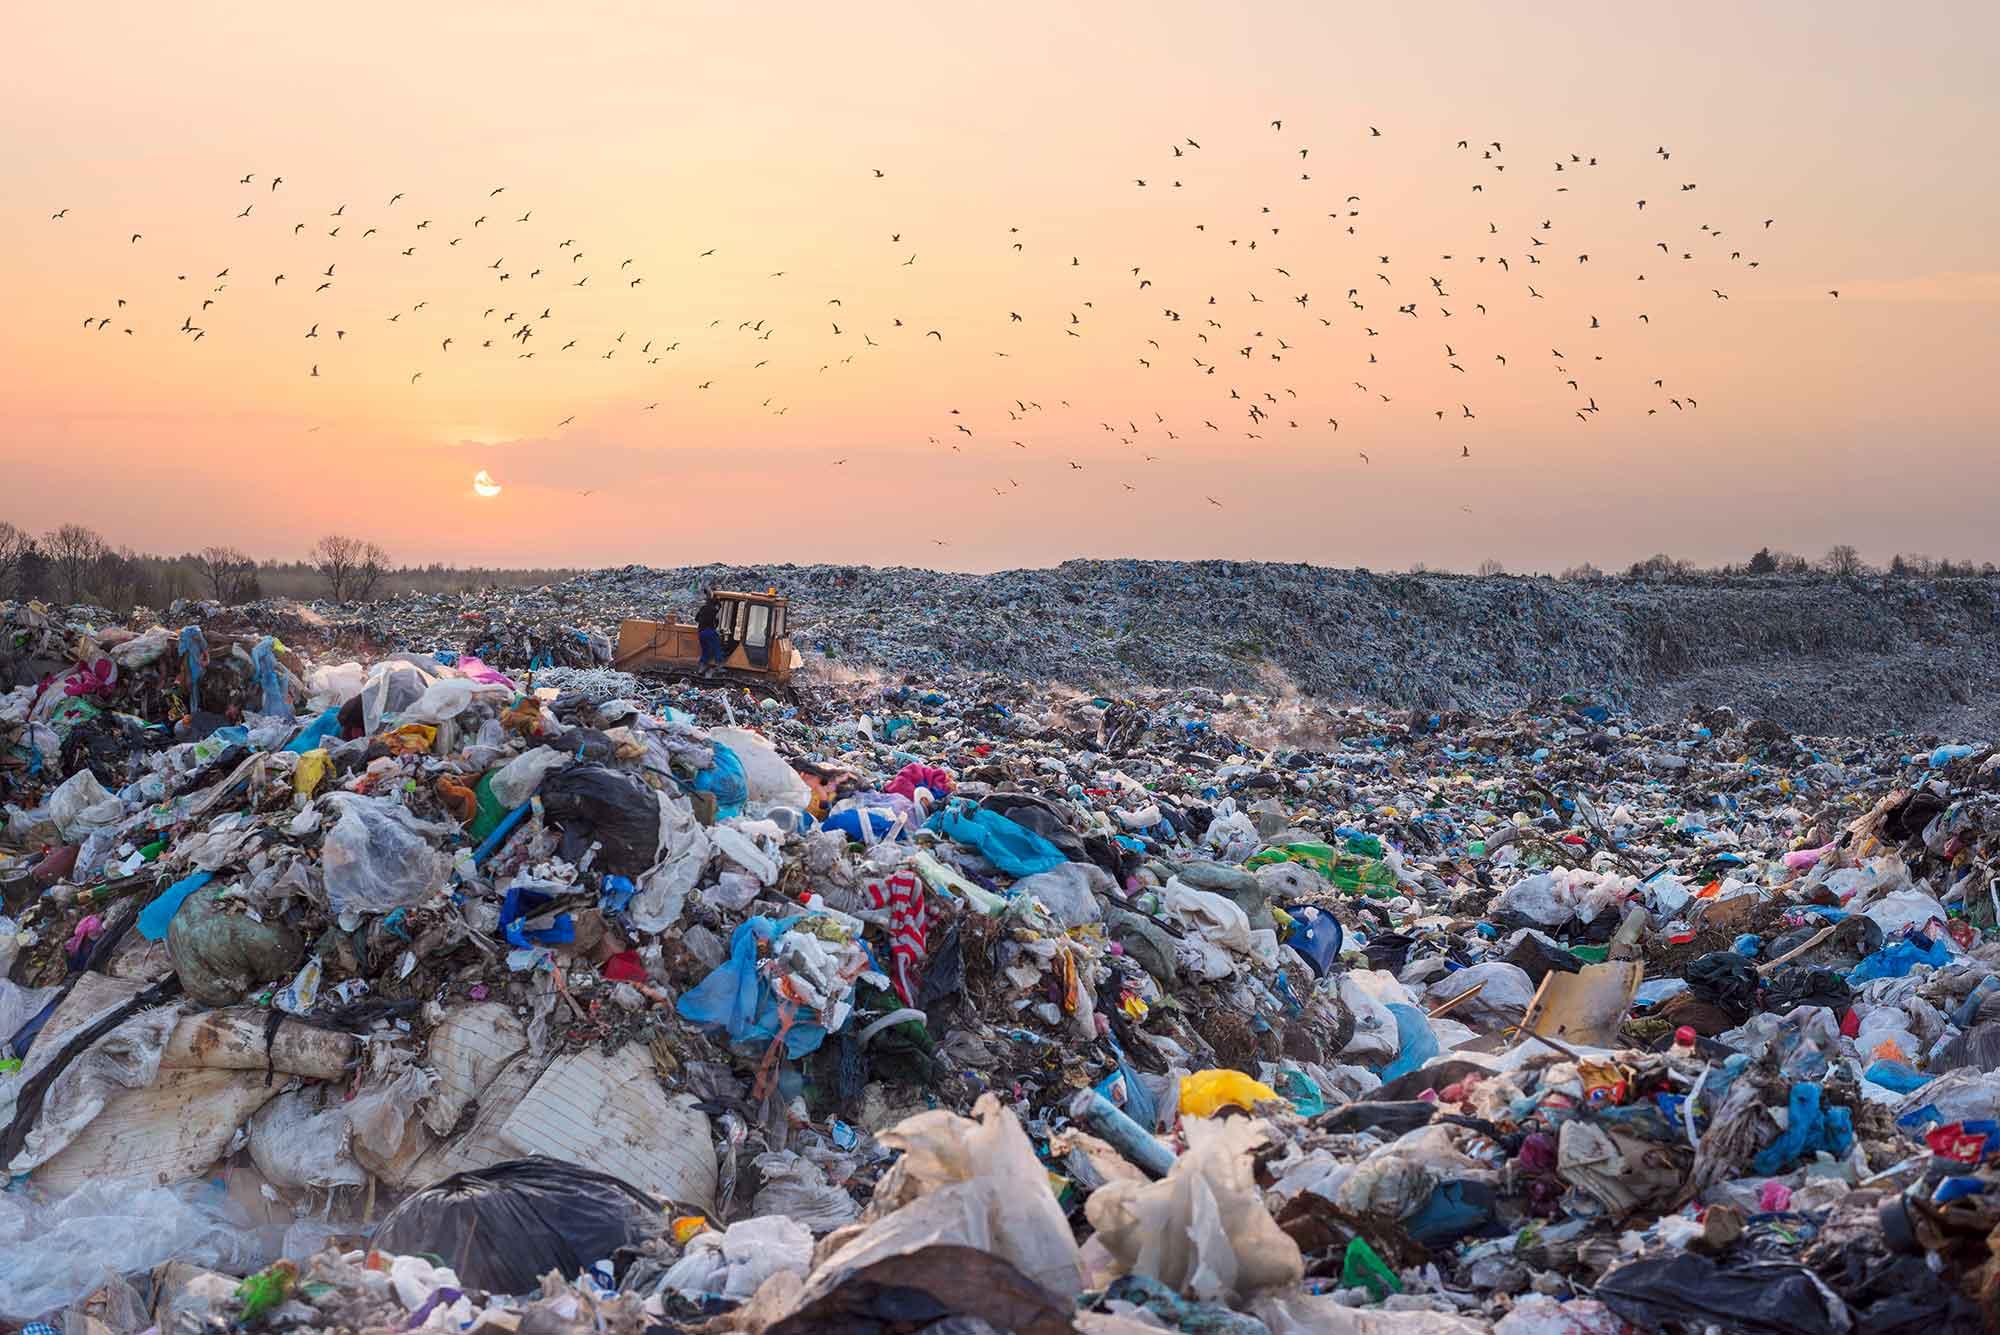 Waste plastics in landfill